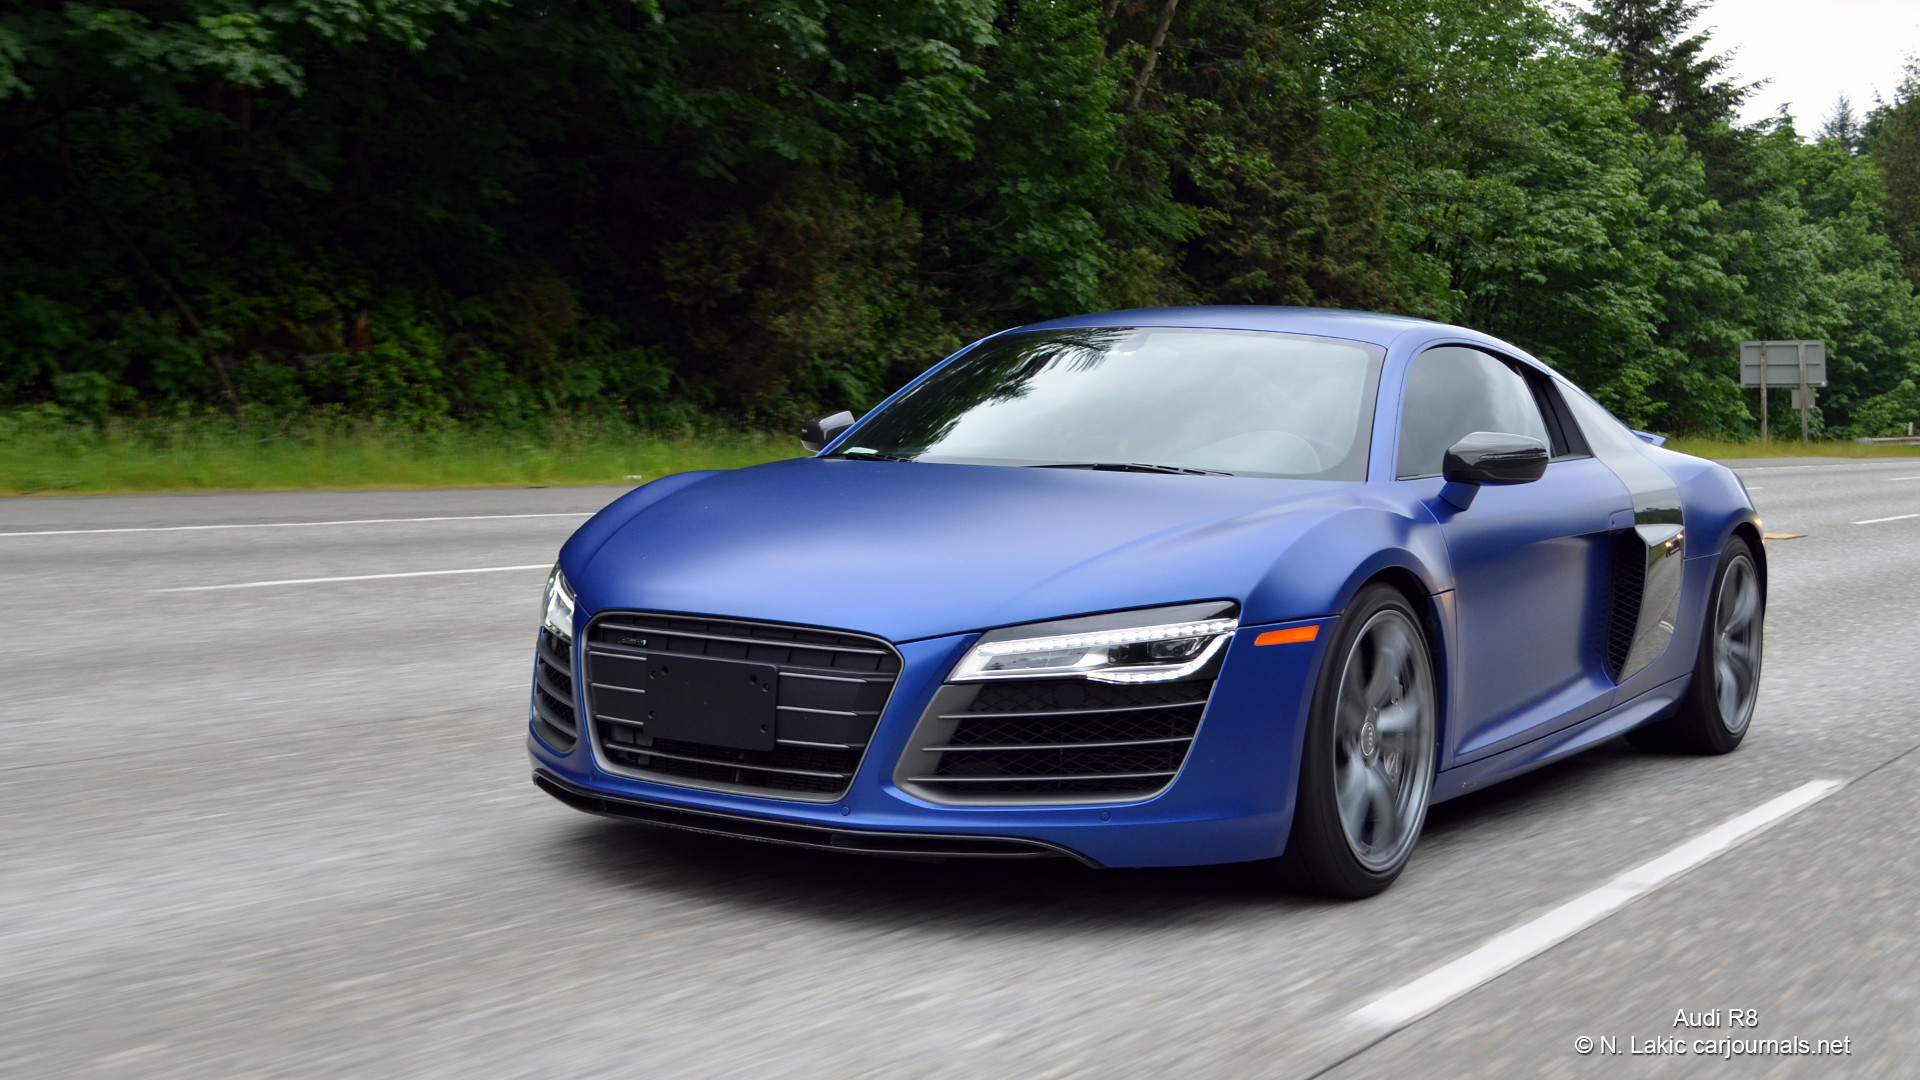 HD Car Wallpapers – Blue Audi R8 – Car Journals